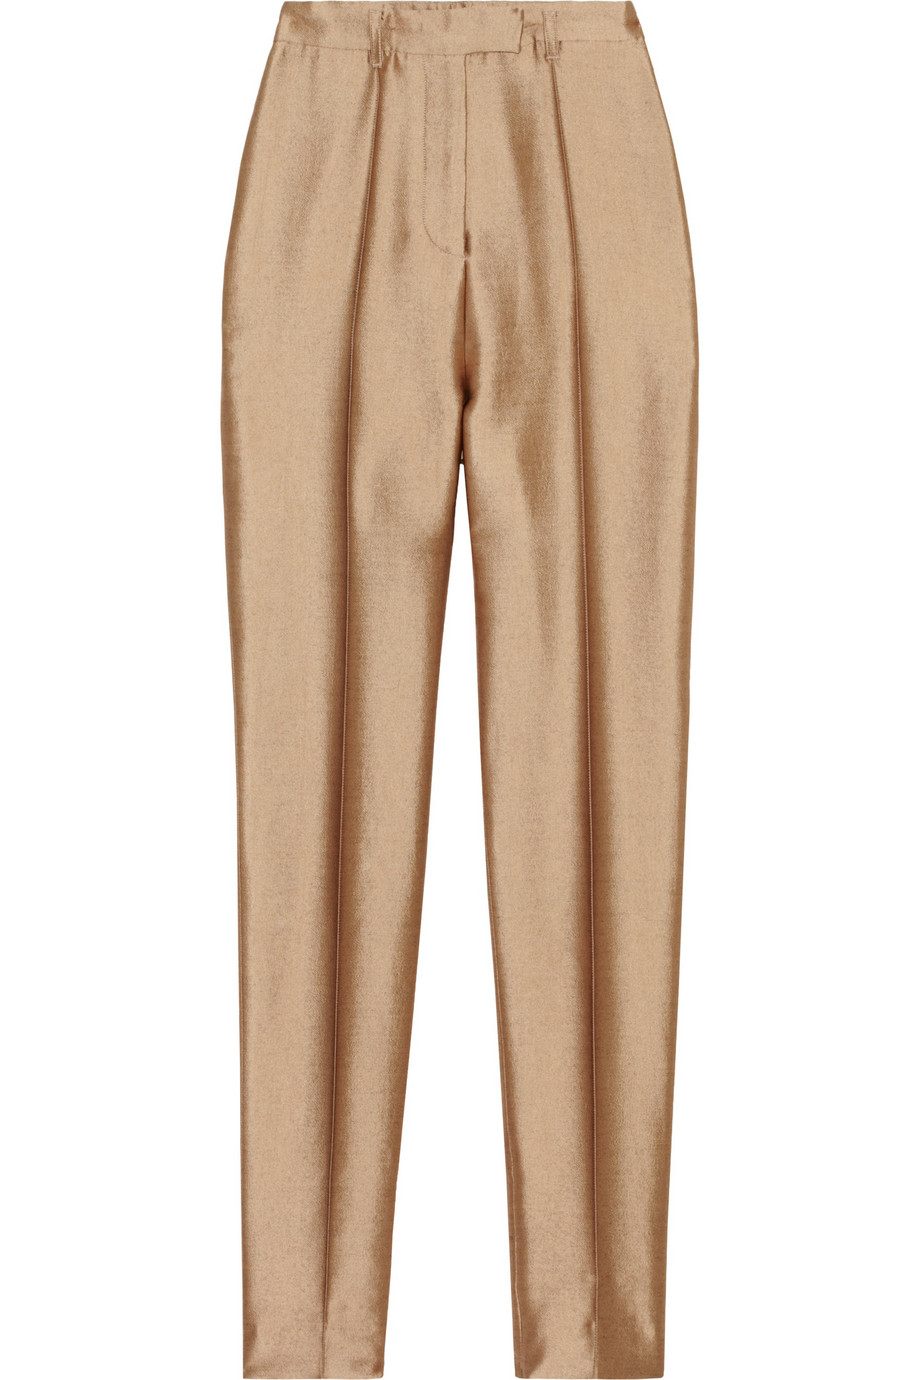 b9cdf042 Mens Silk And Wool Dress Pants - raveitsafe